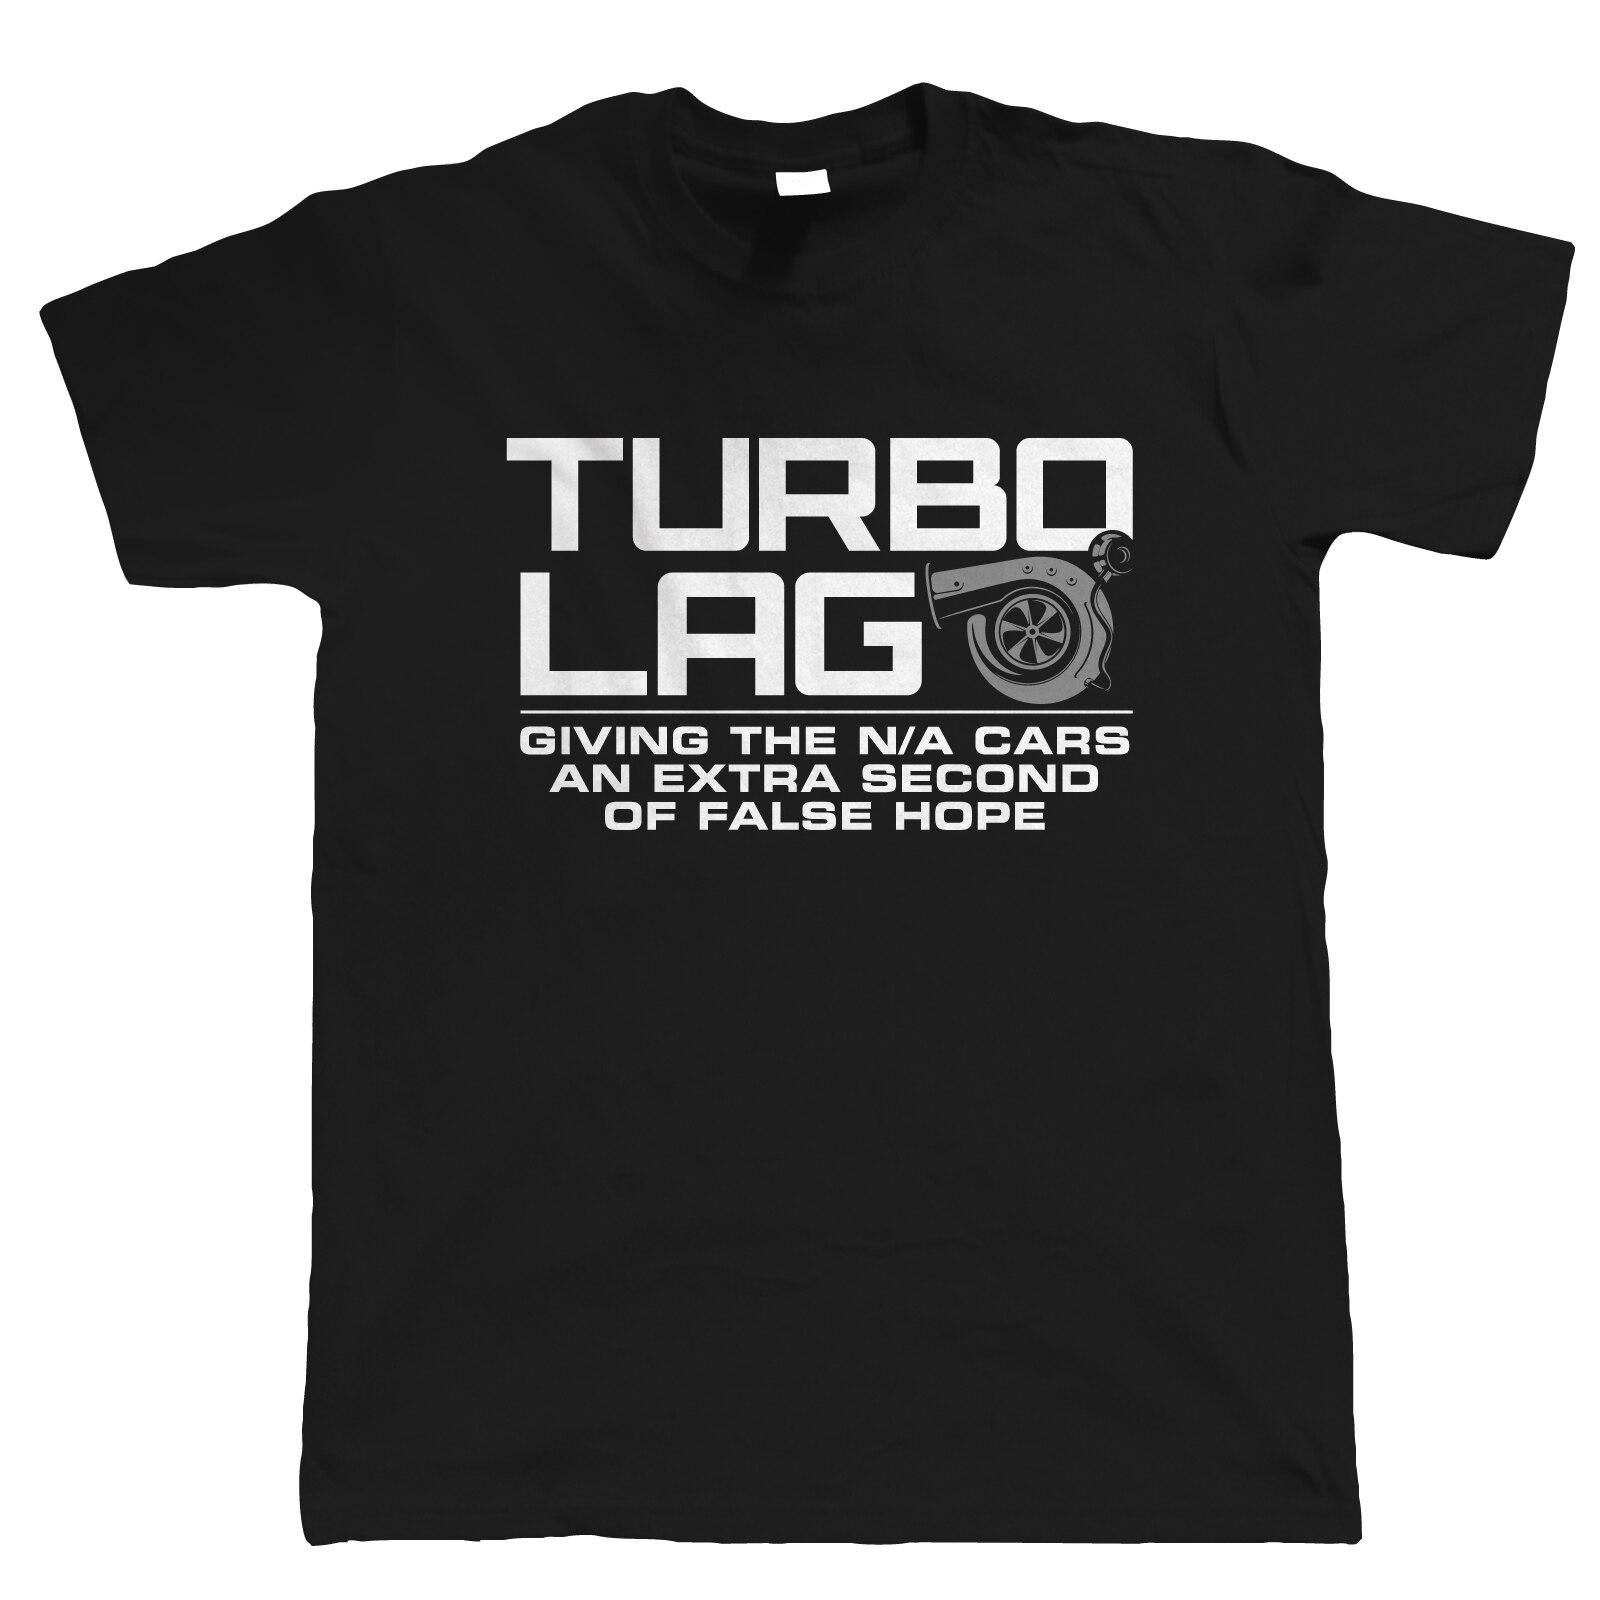 2019 Nieuwe Collectie MenS Fashion Turbogat Mens Grappige Auto T-shirt-Gift voor Hem Papa Slepen Racinger Drift motorsport Zomer T-Shirt